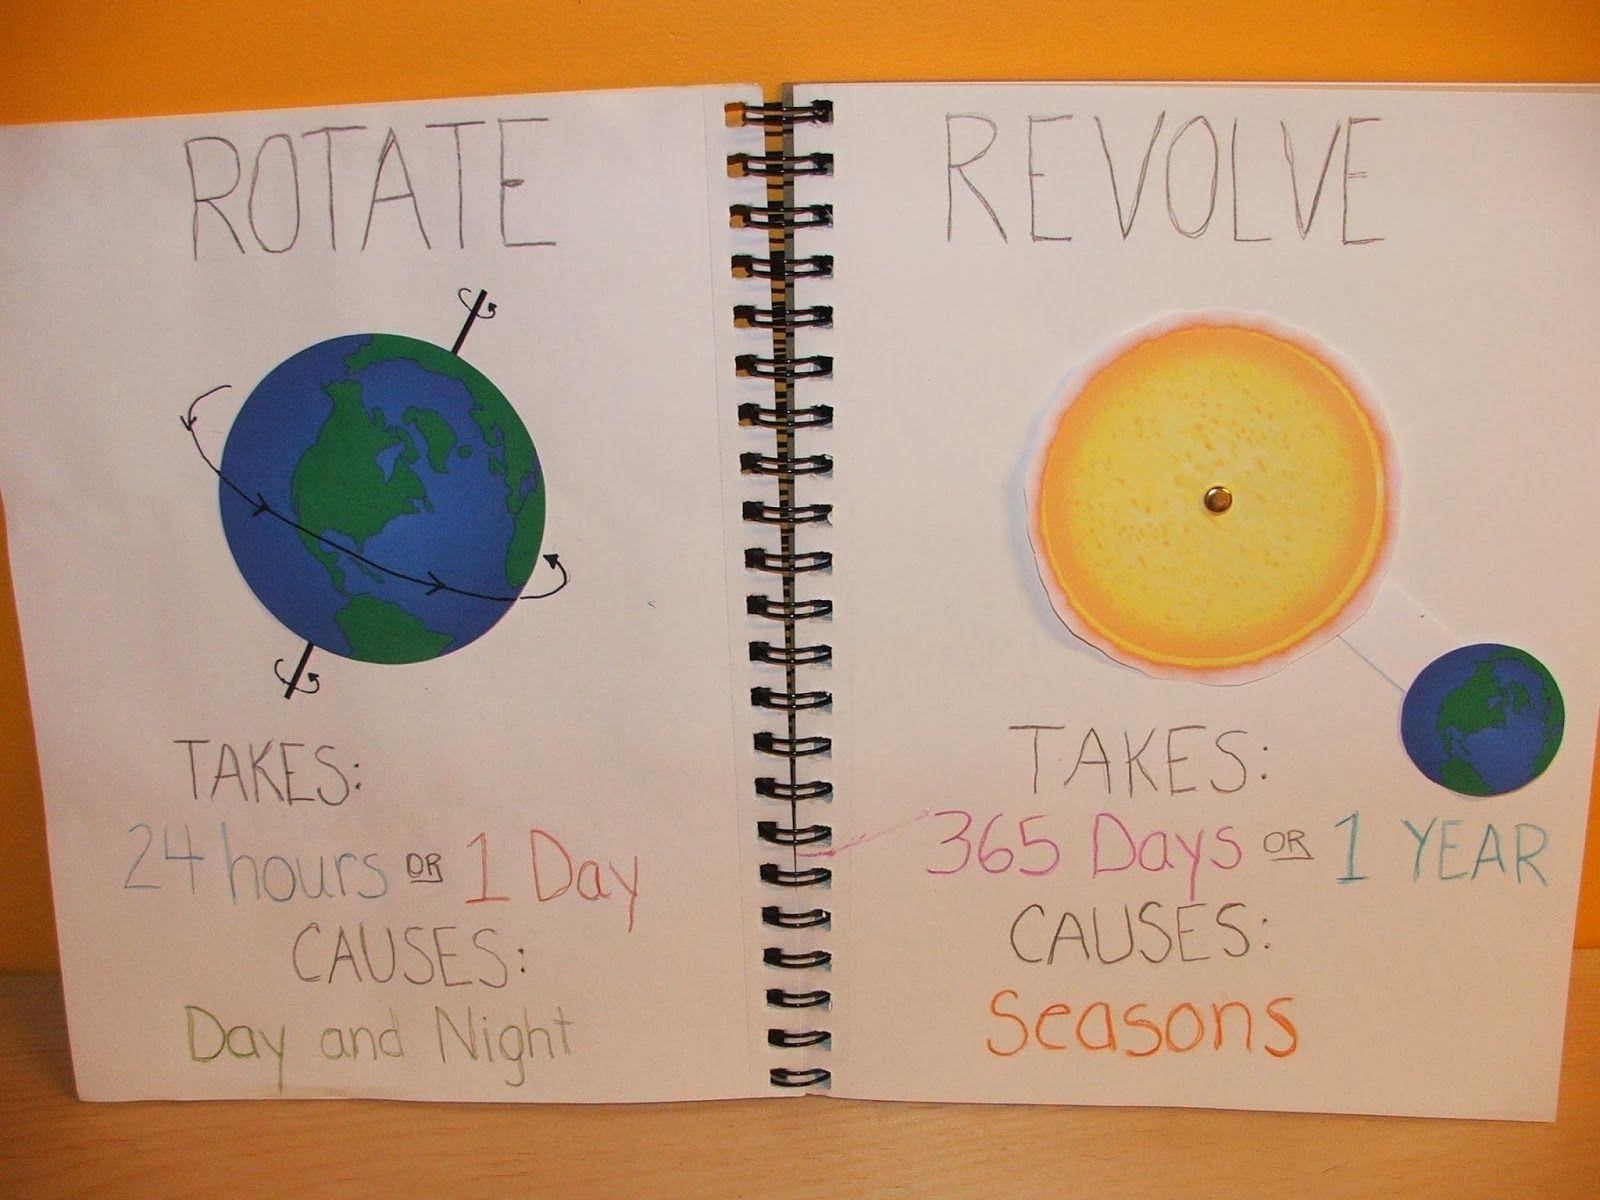 Highland Heritage Homeschool Rotation Vs Revolution